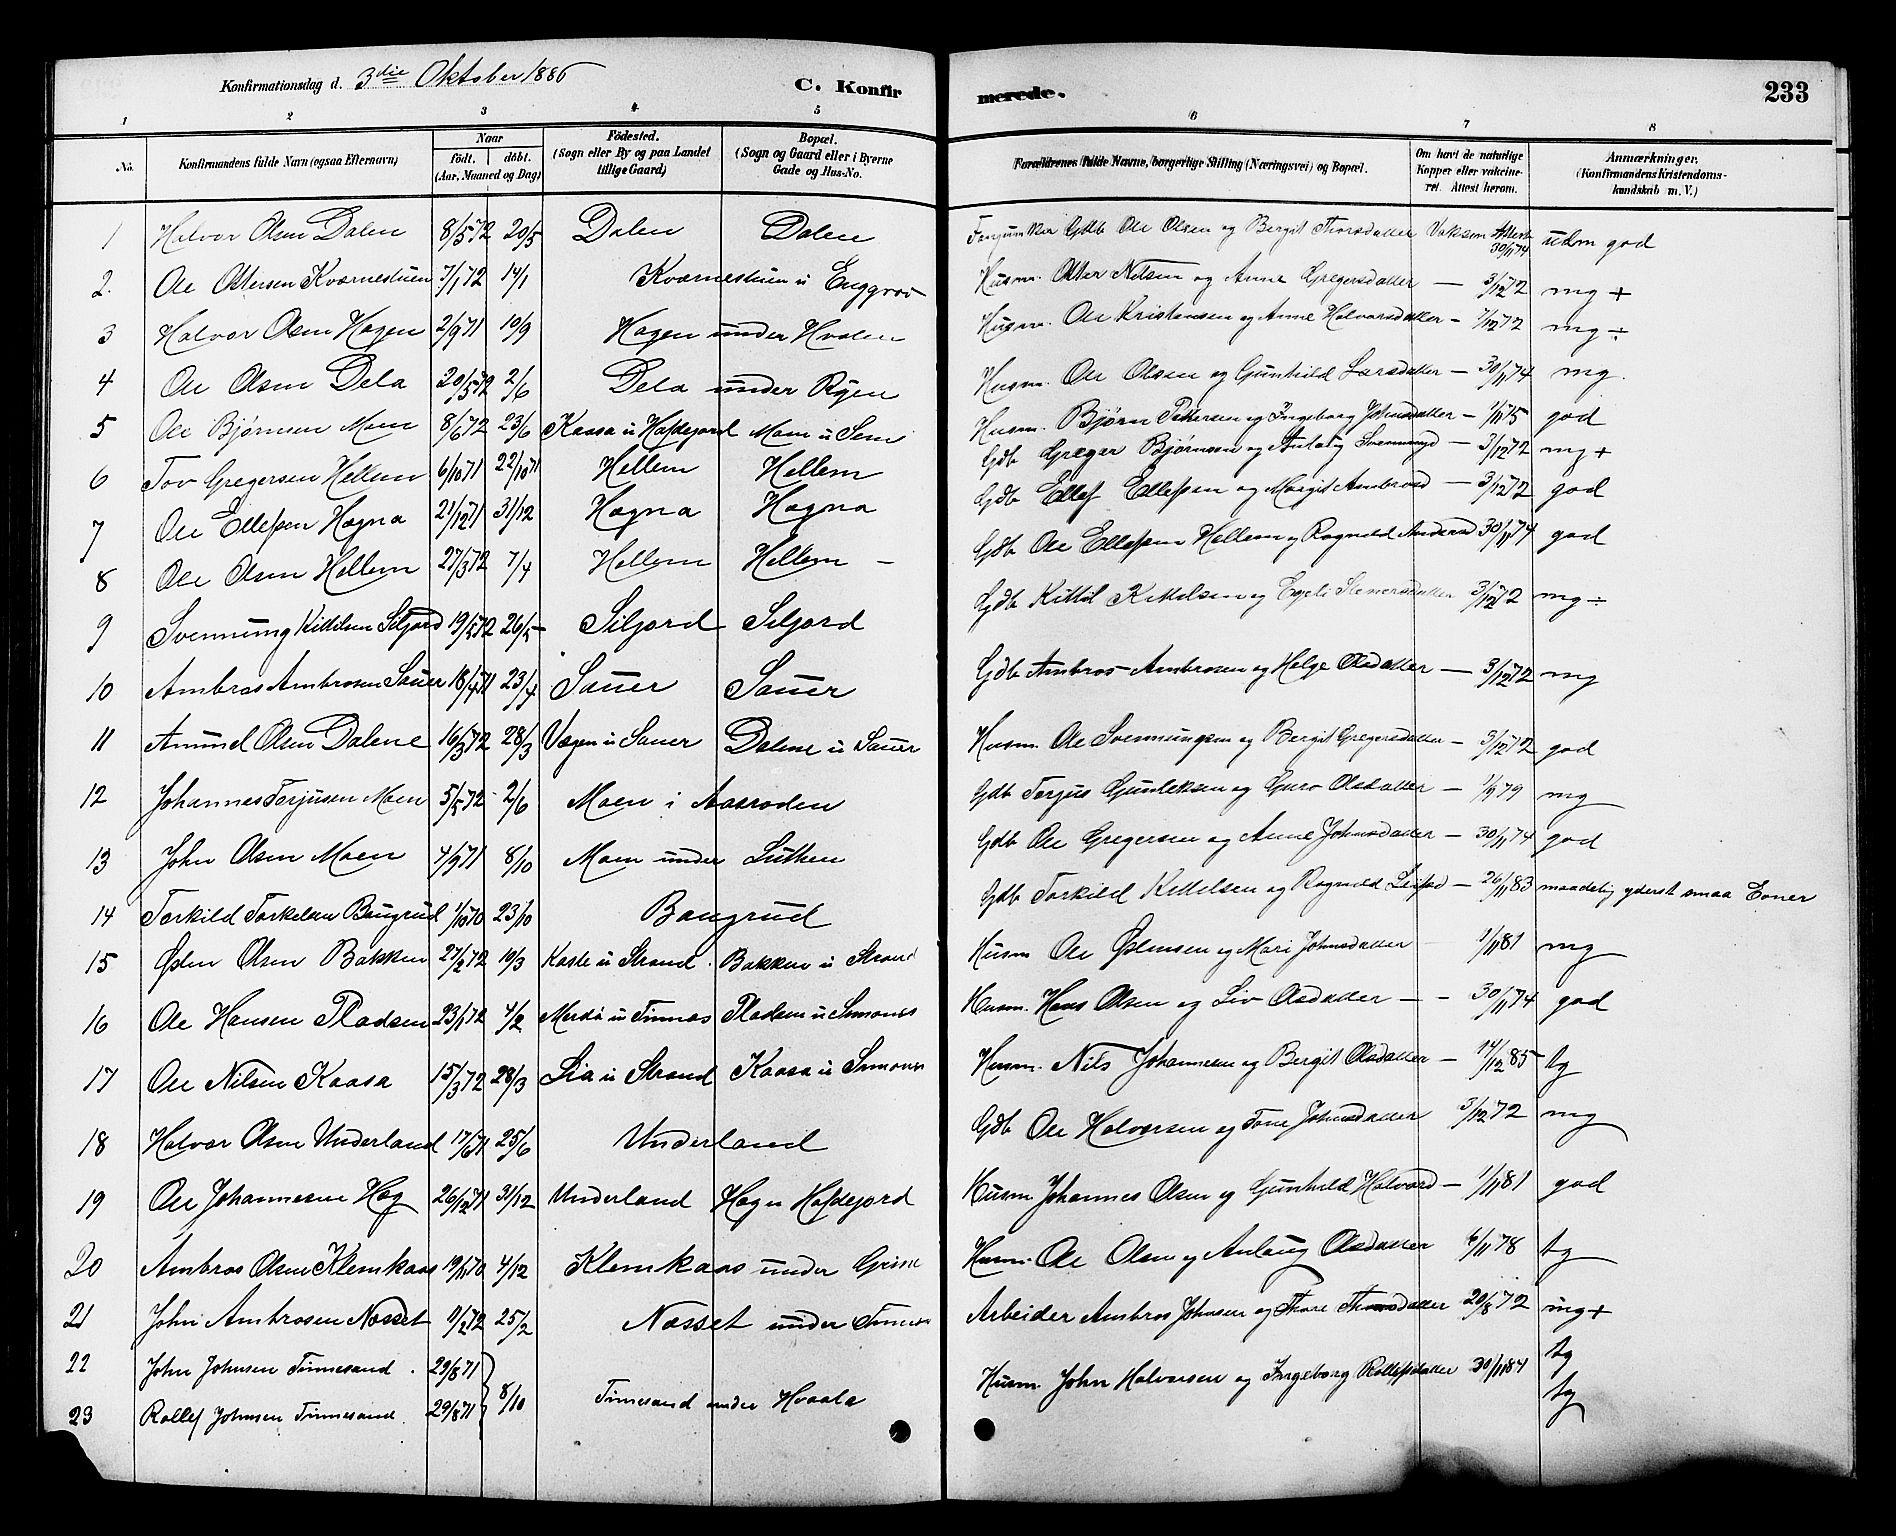 SAKO, Heddal kirkebøker, G/Ga/L0002: Klokkerbok nr. I 2, 1879-1908, s. 233